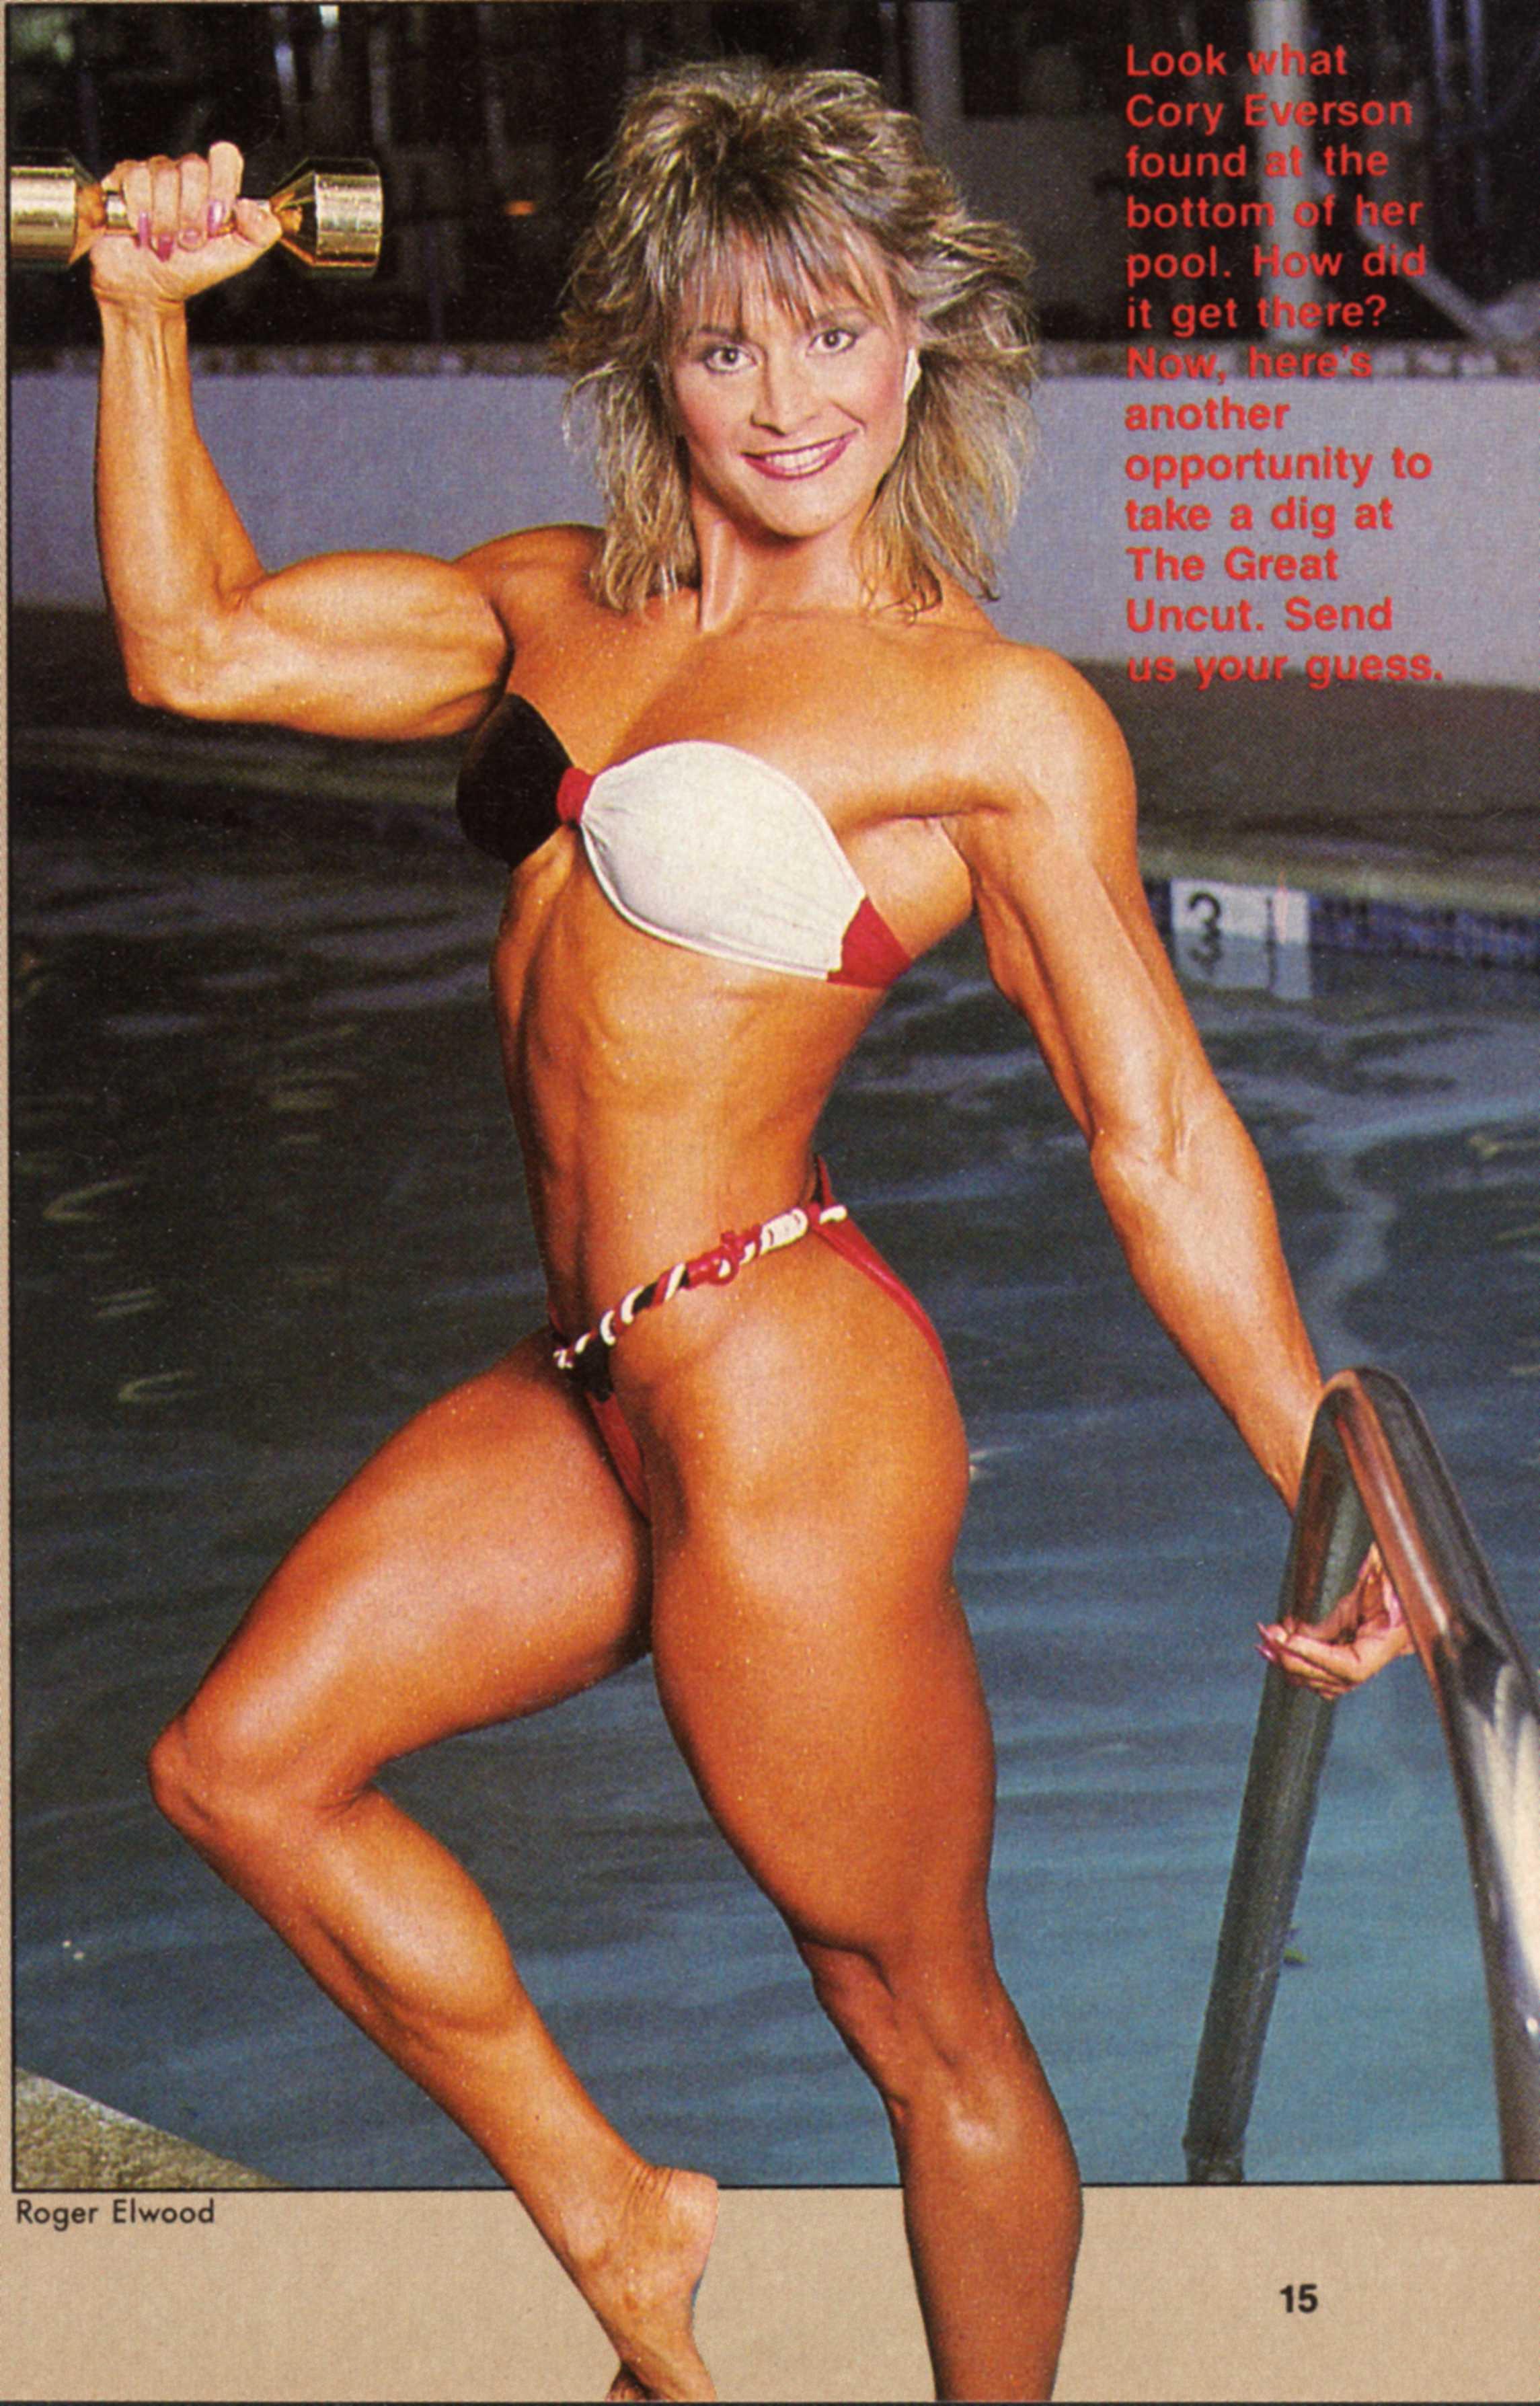 Cory everson biceps-1241